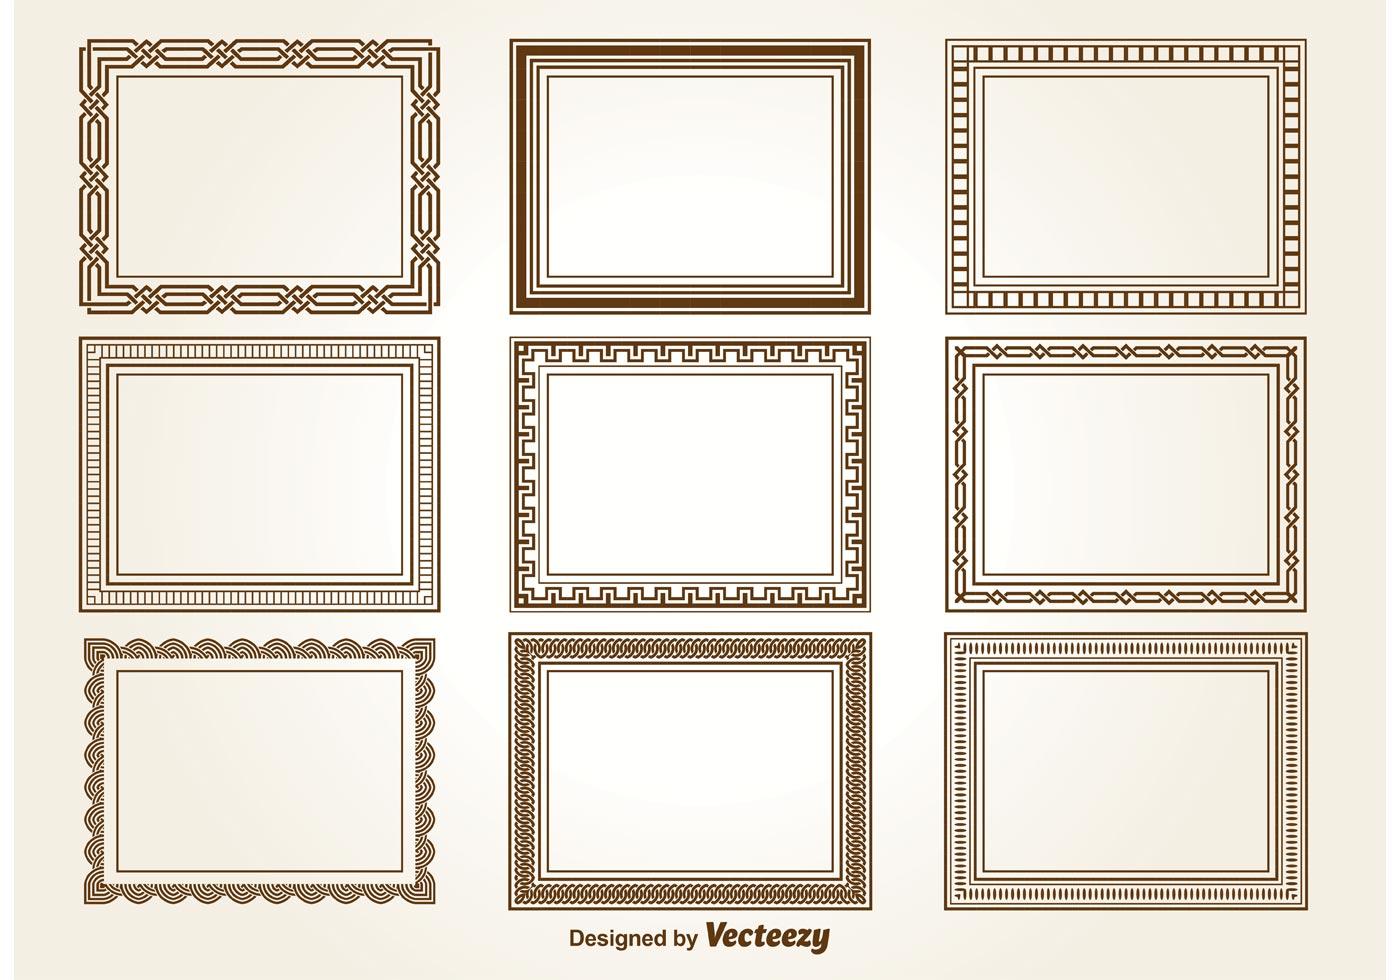 Decorative Square Frames - Download Free Vectors, Clipart ...Fancy Square Frame